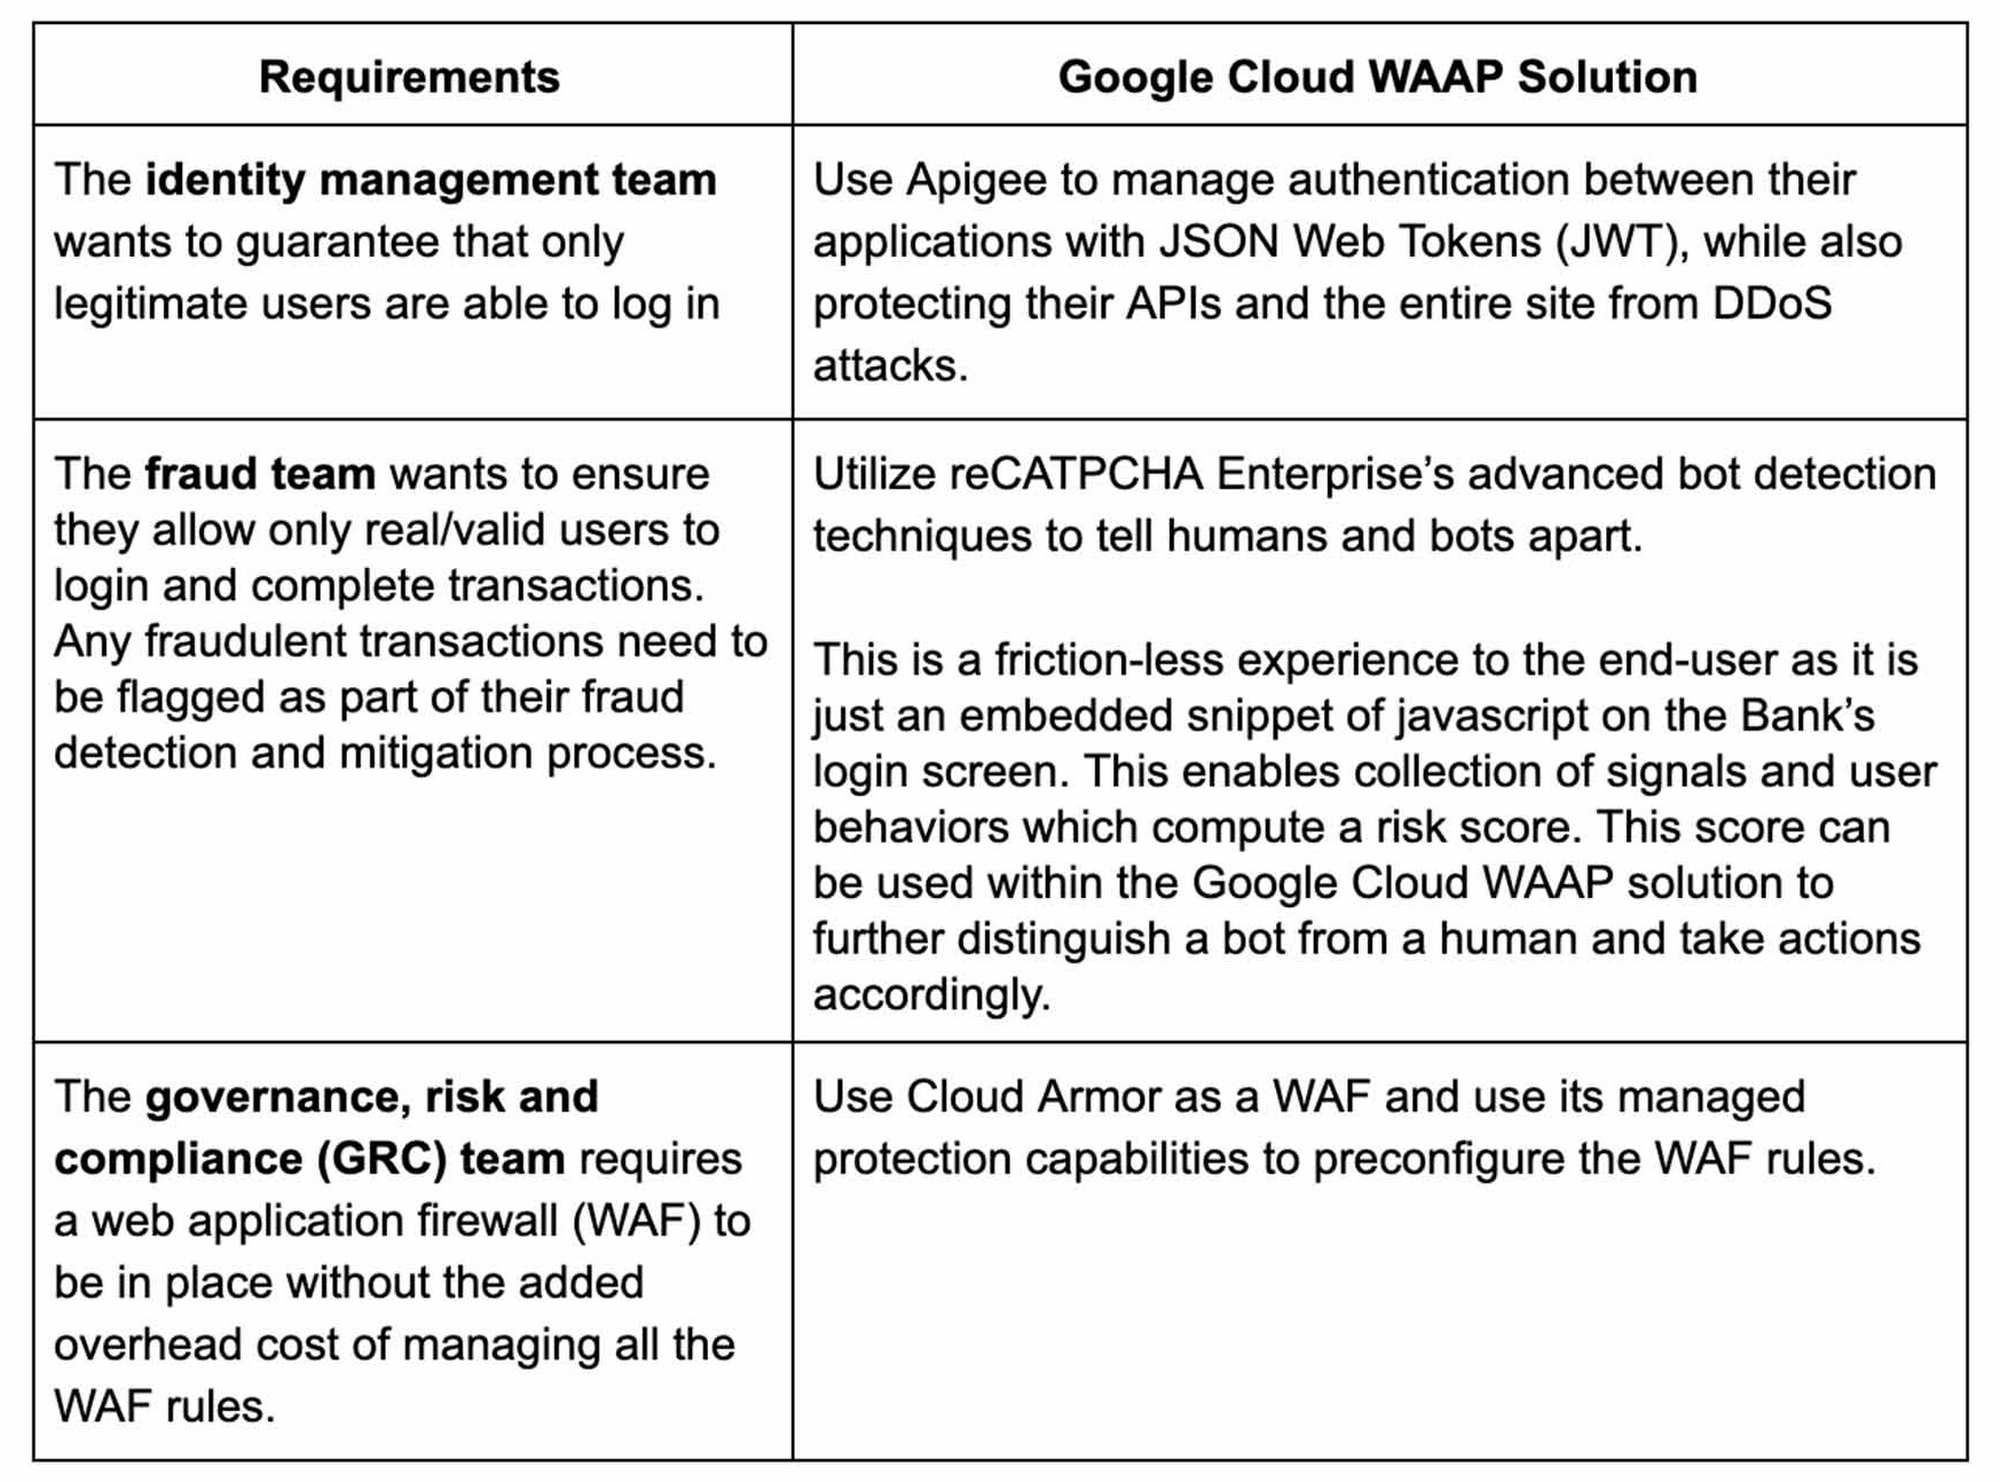 Balancing security requirements.jpg